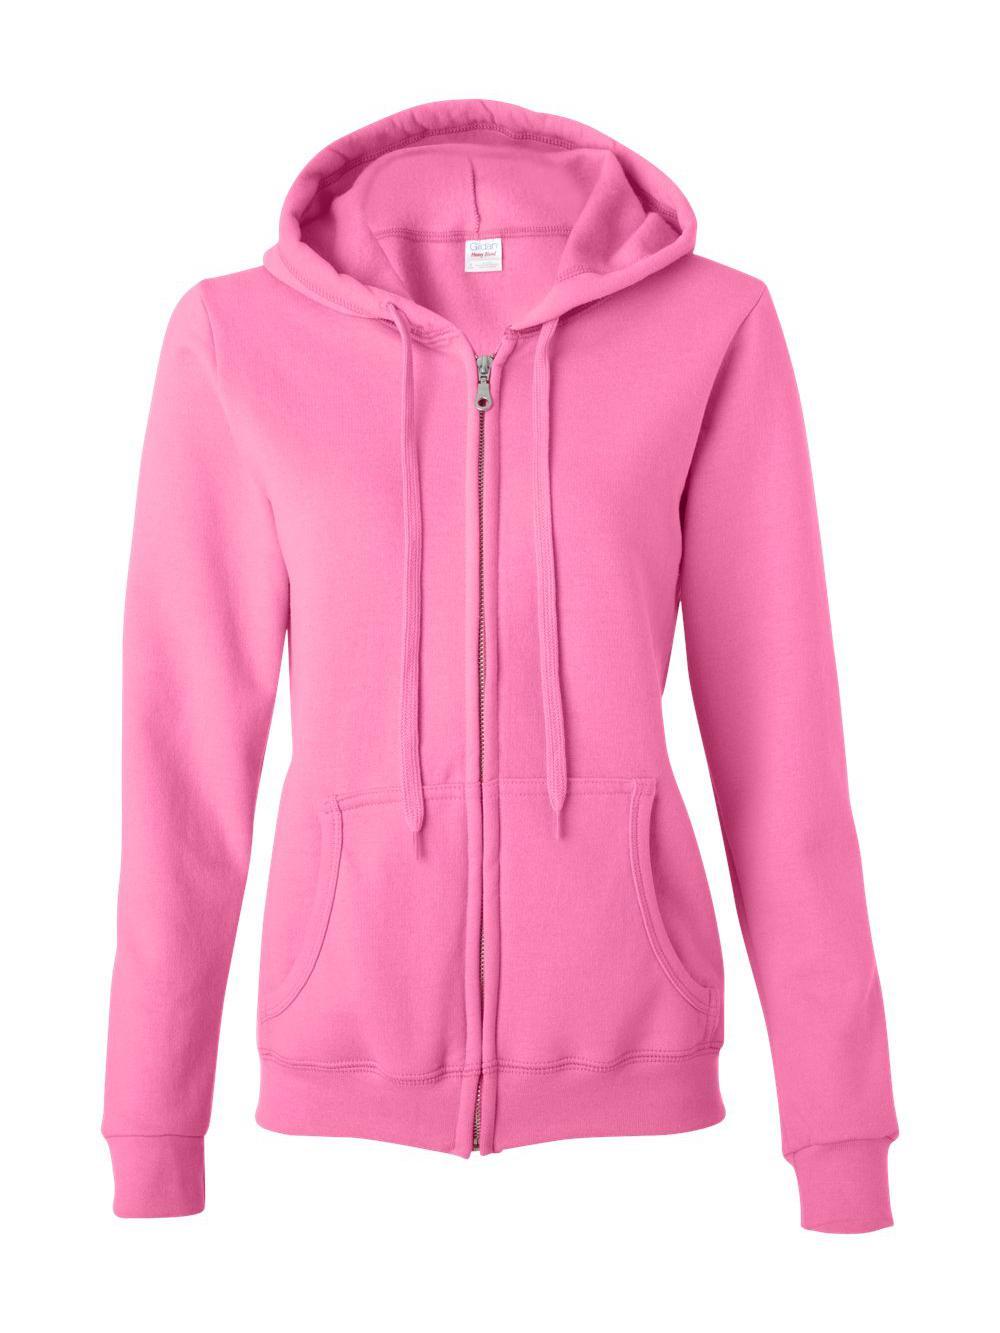 Gildan-Heavy-Blend-Women-039-s-Full-Zip-Hooded-Sweatshirt-18600FL thumbnail 3